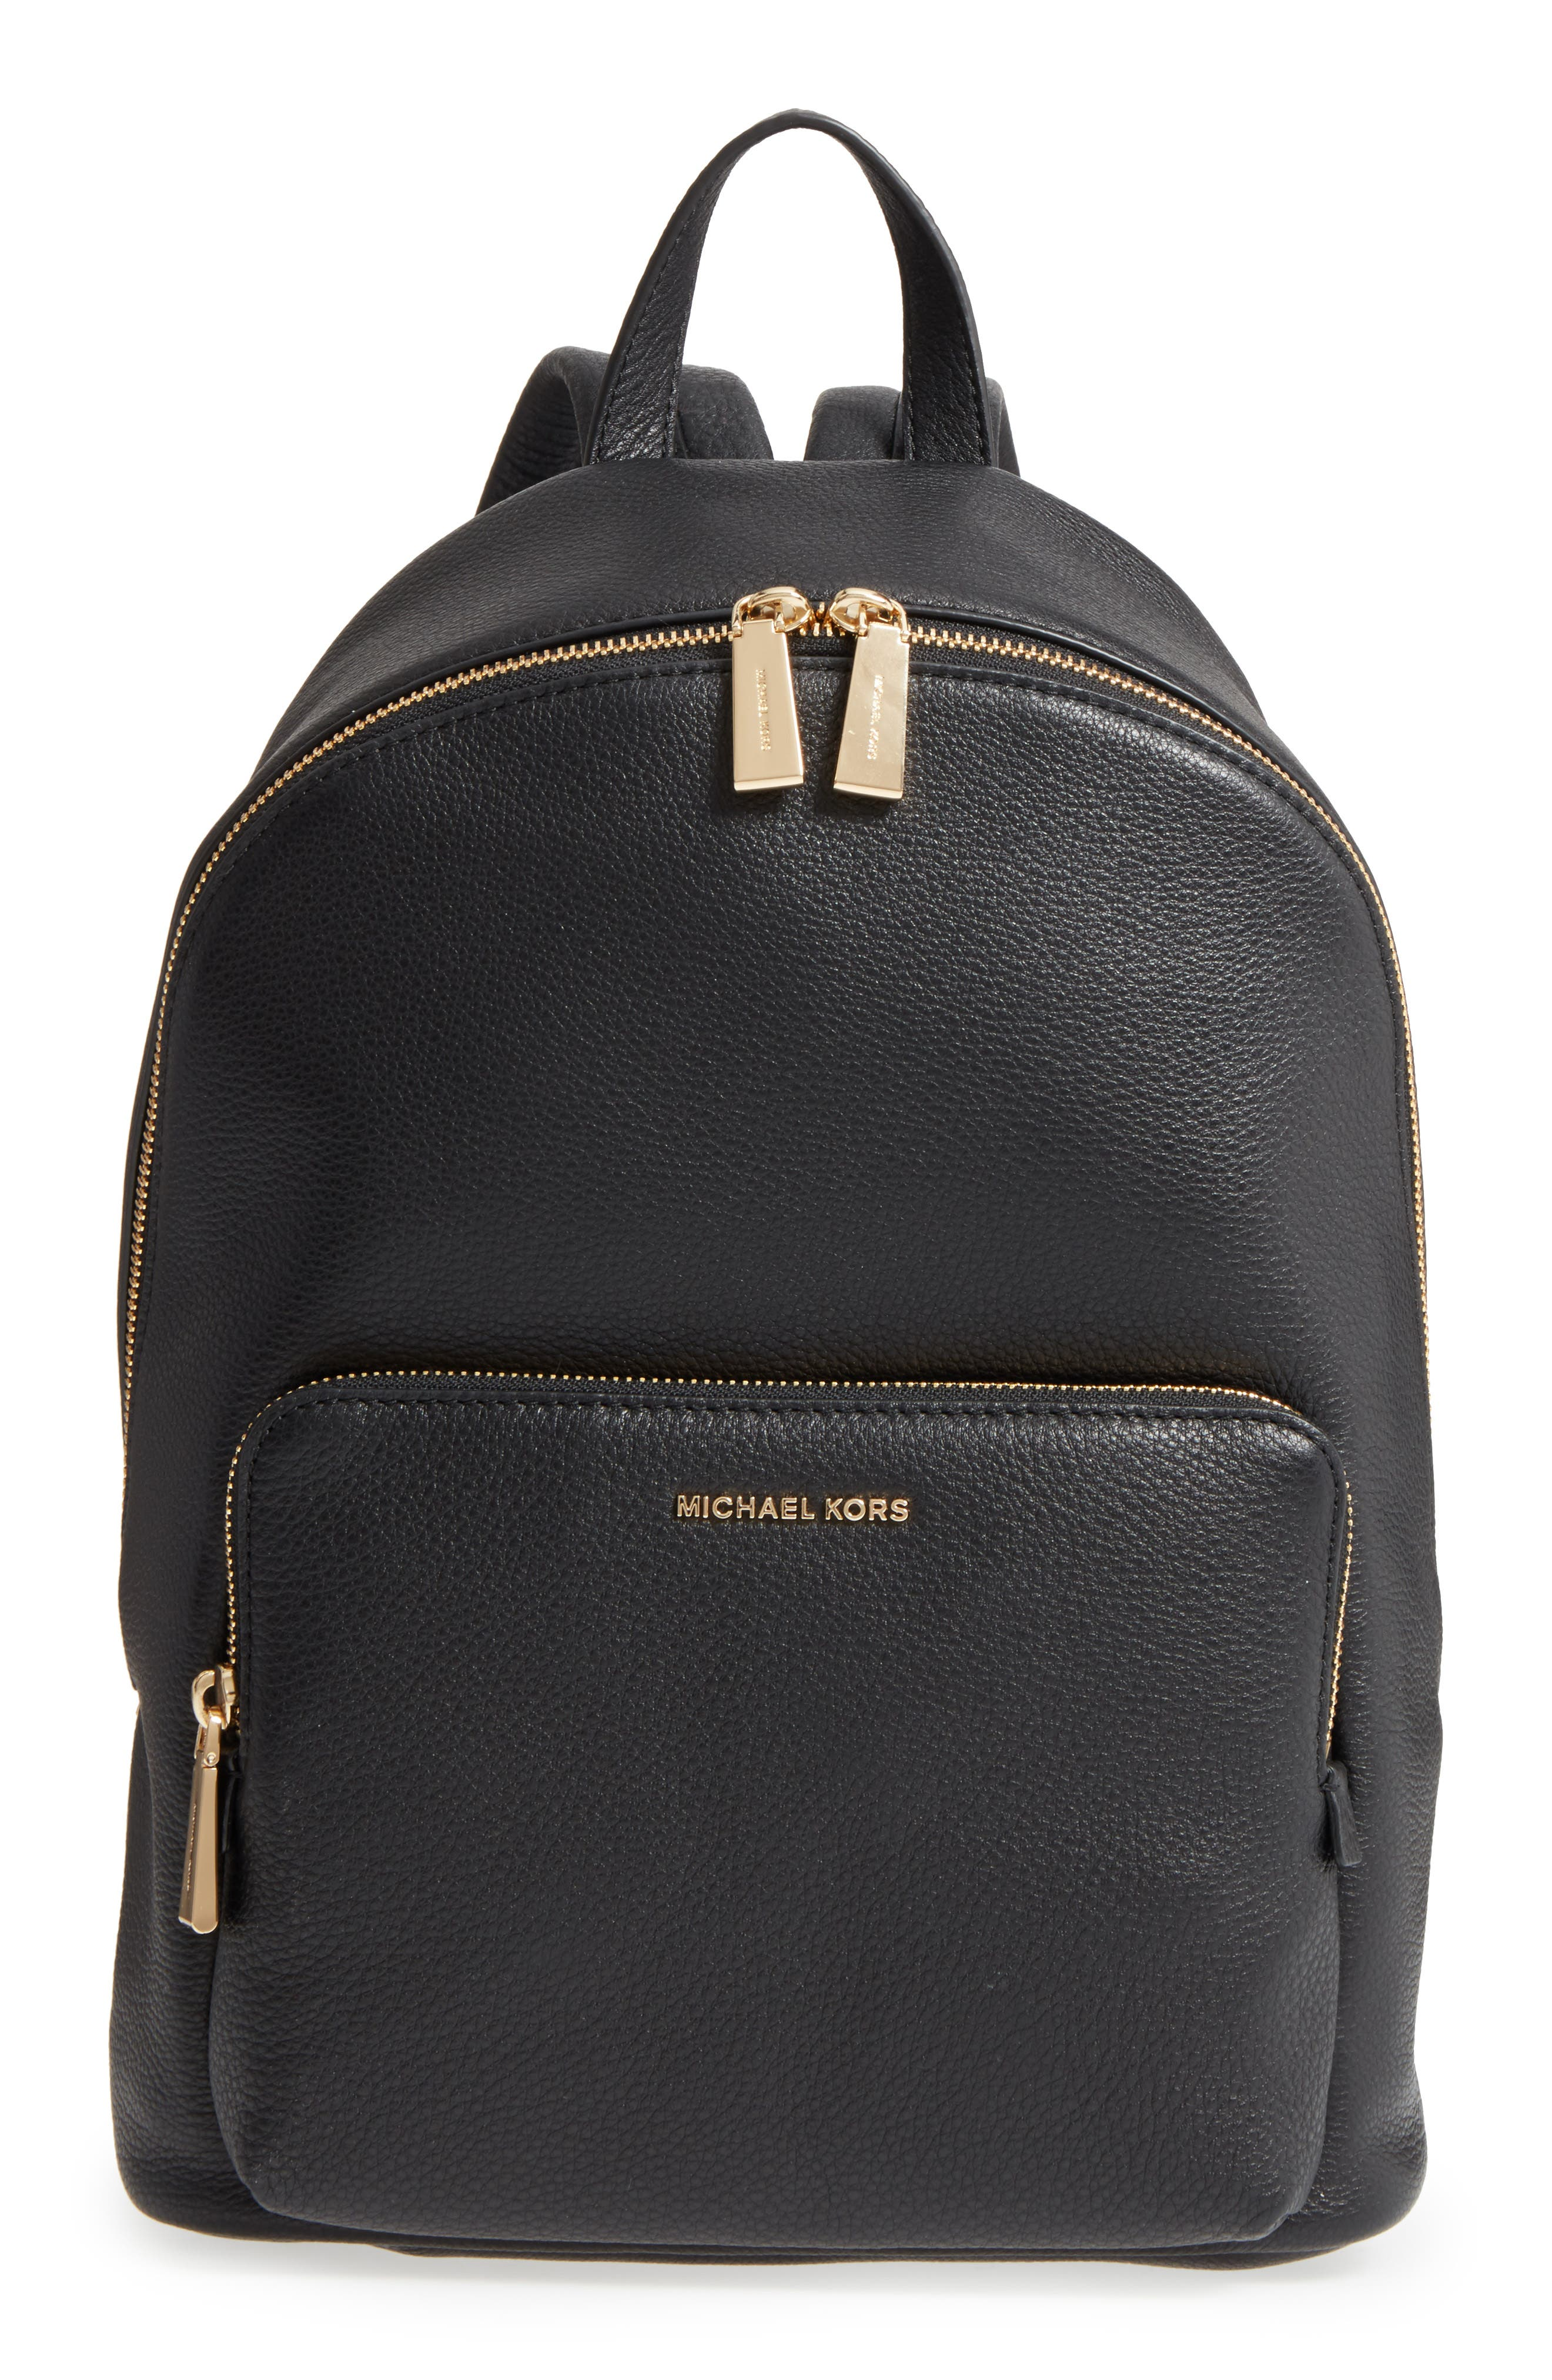 Alternate Image 1 Selected - Michael Kors Large Wythe Leather Backpack